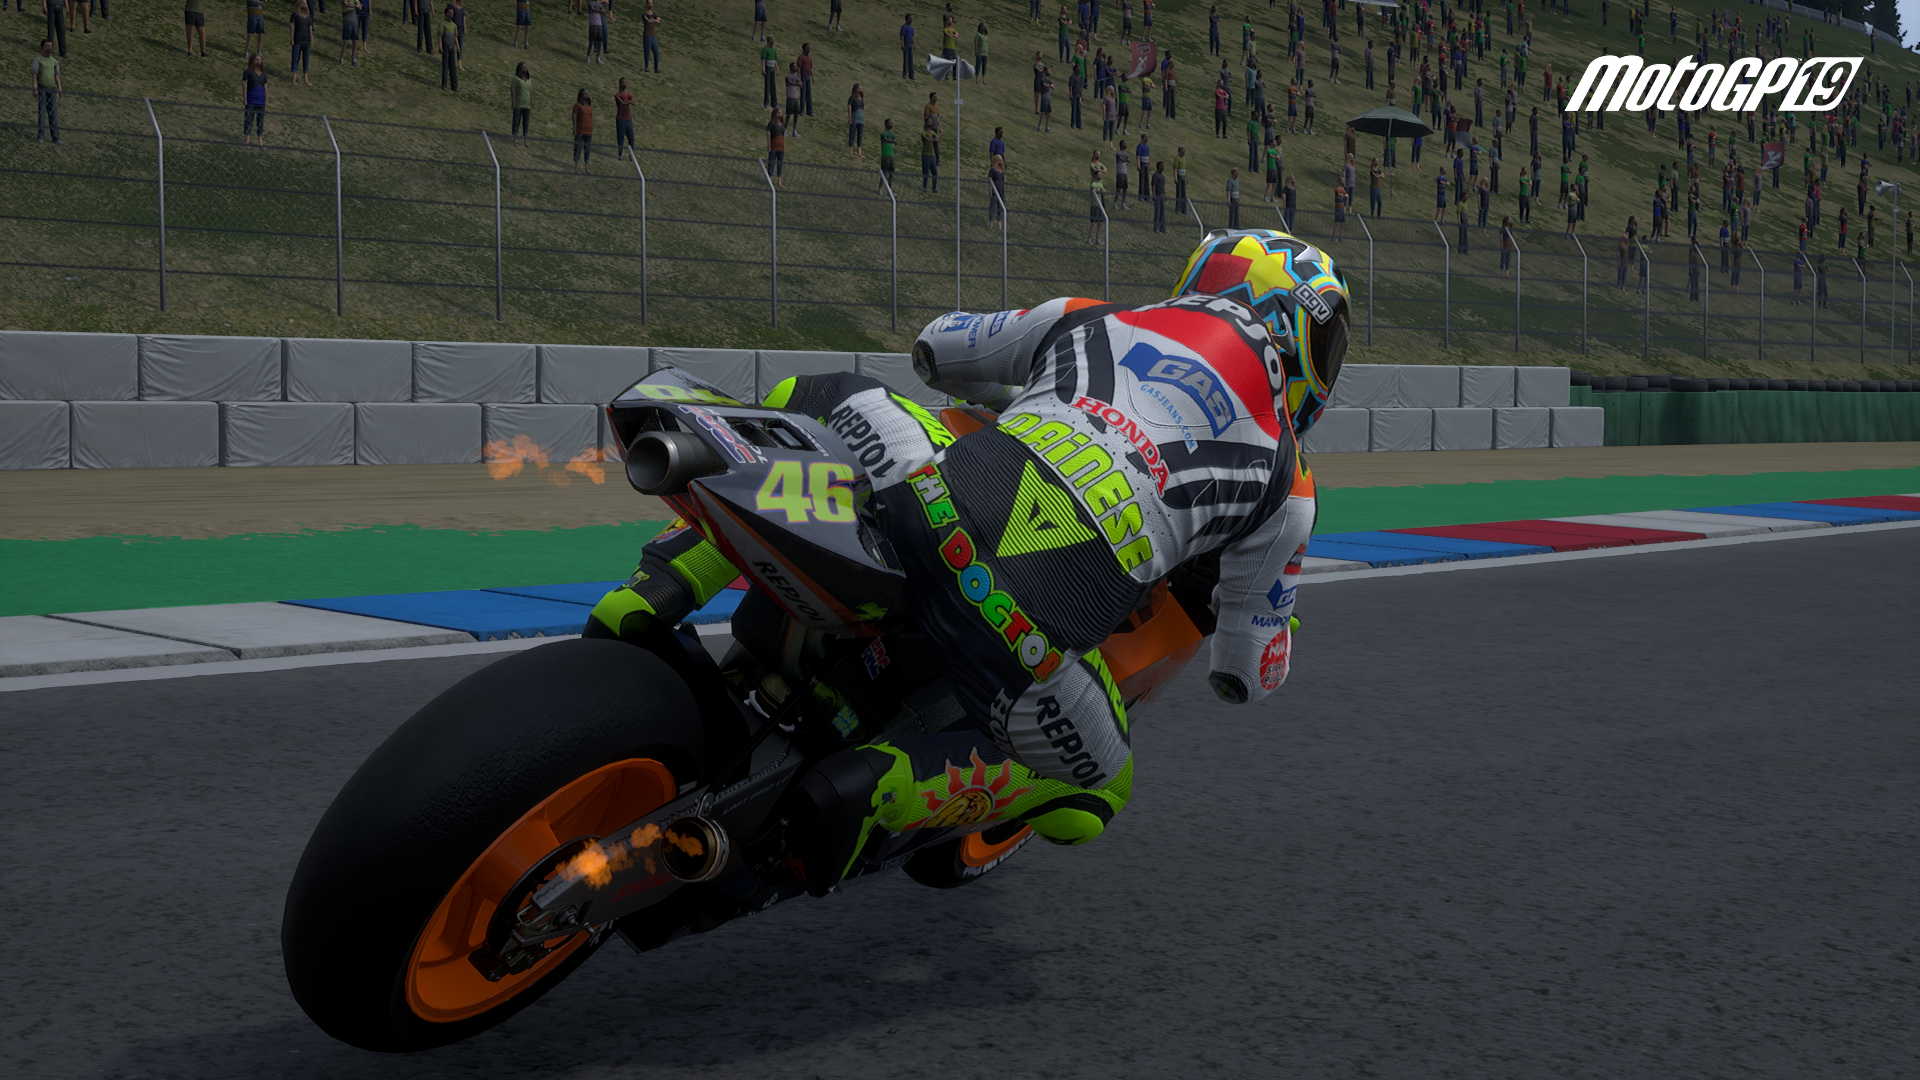 Moto GP 2019 graphics